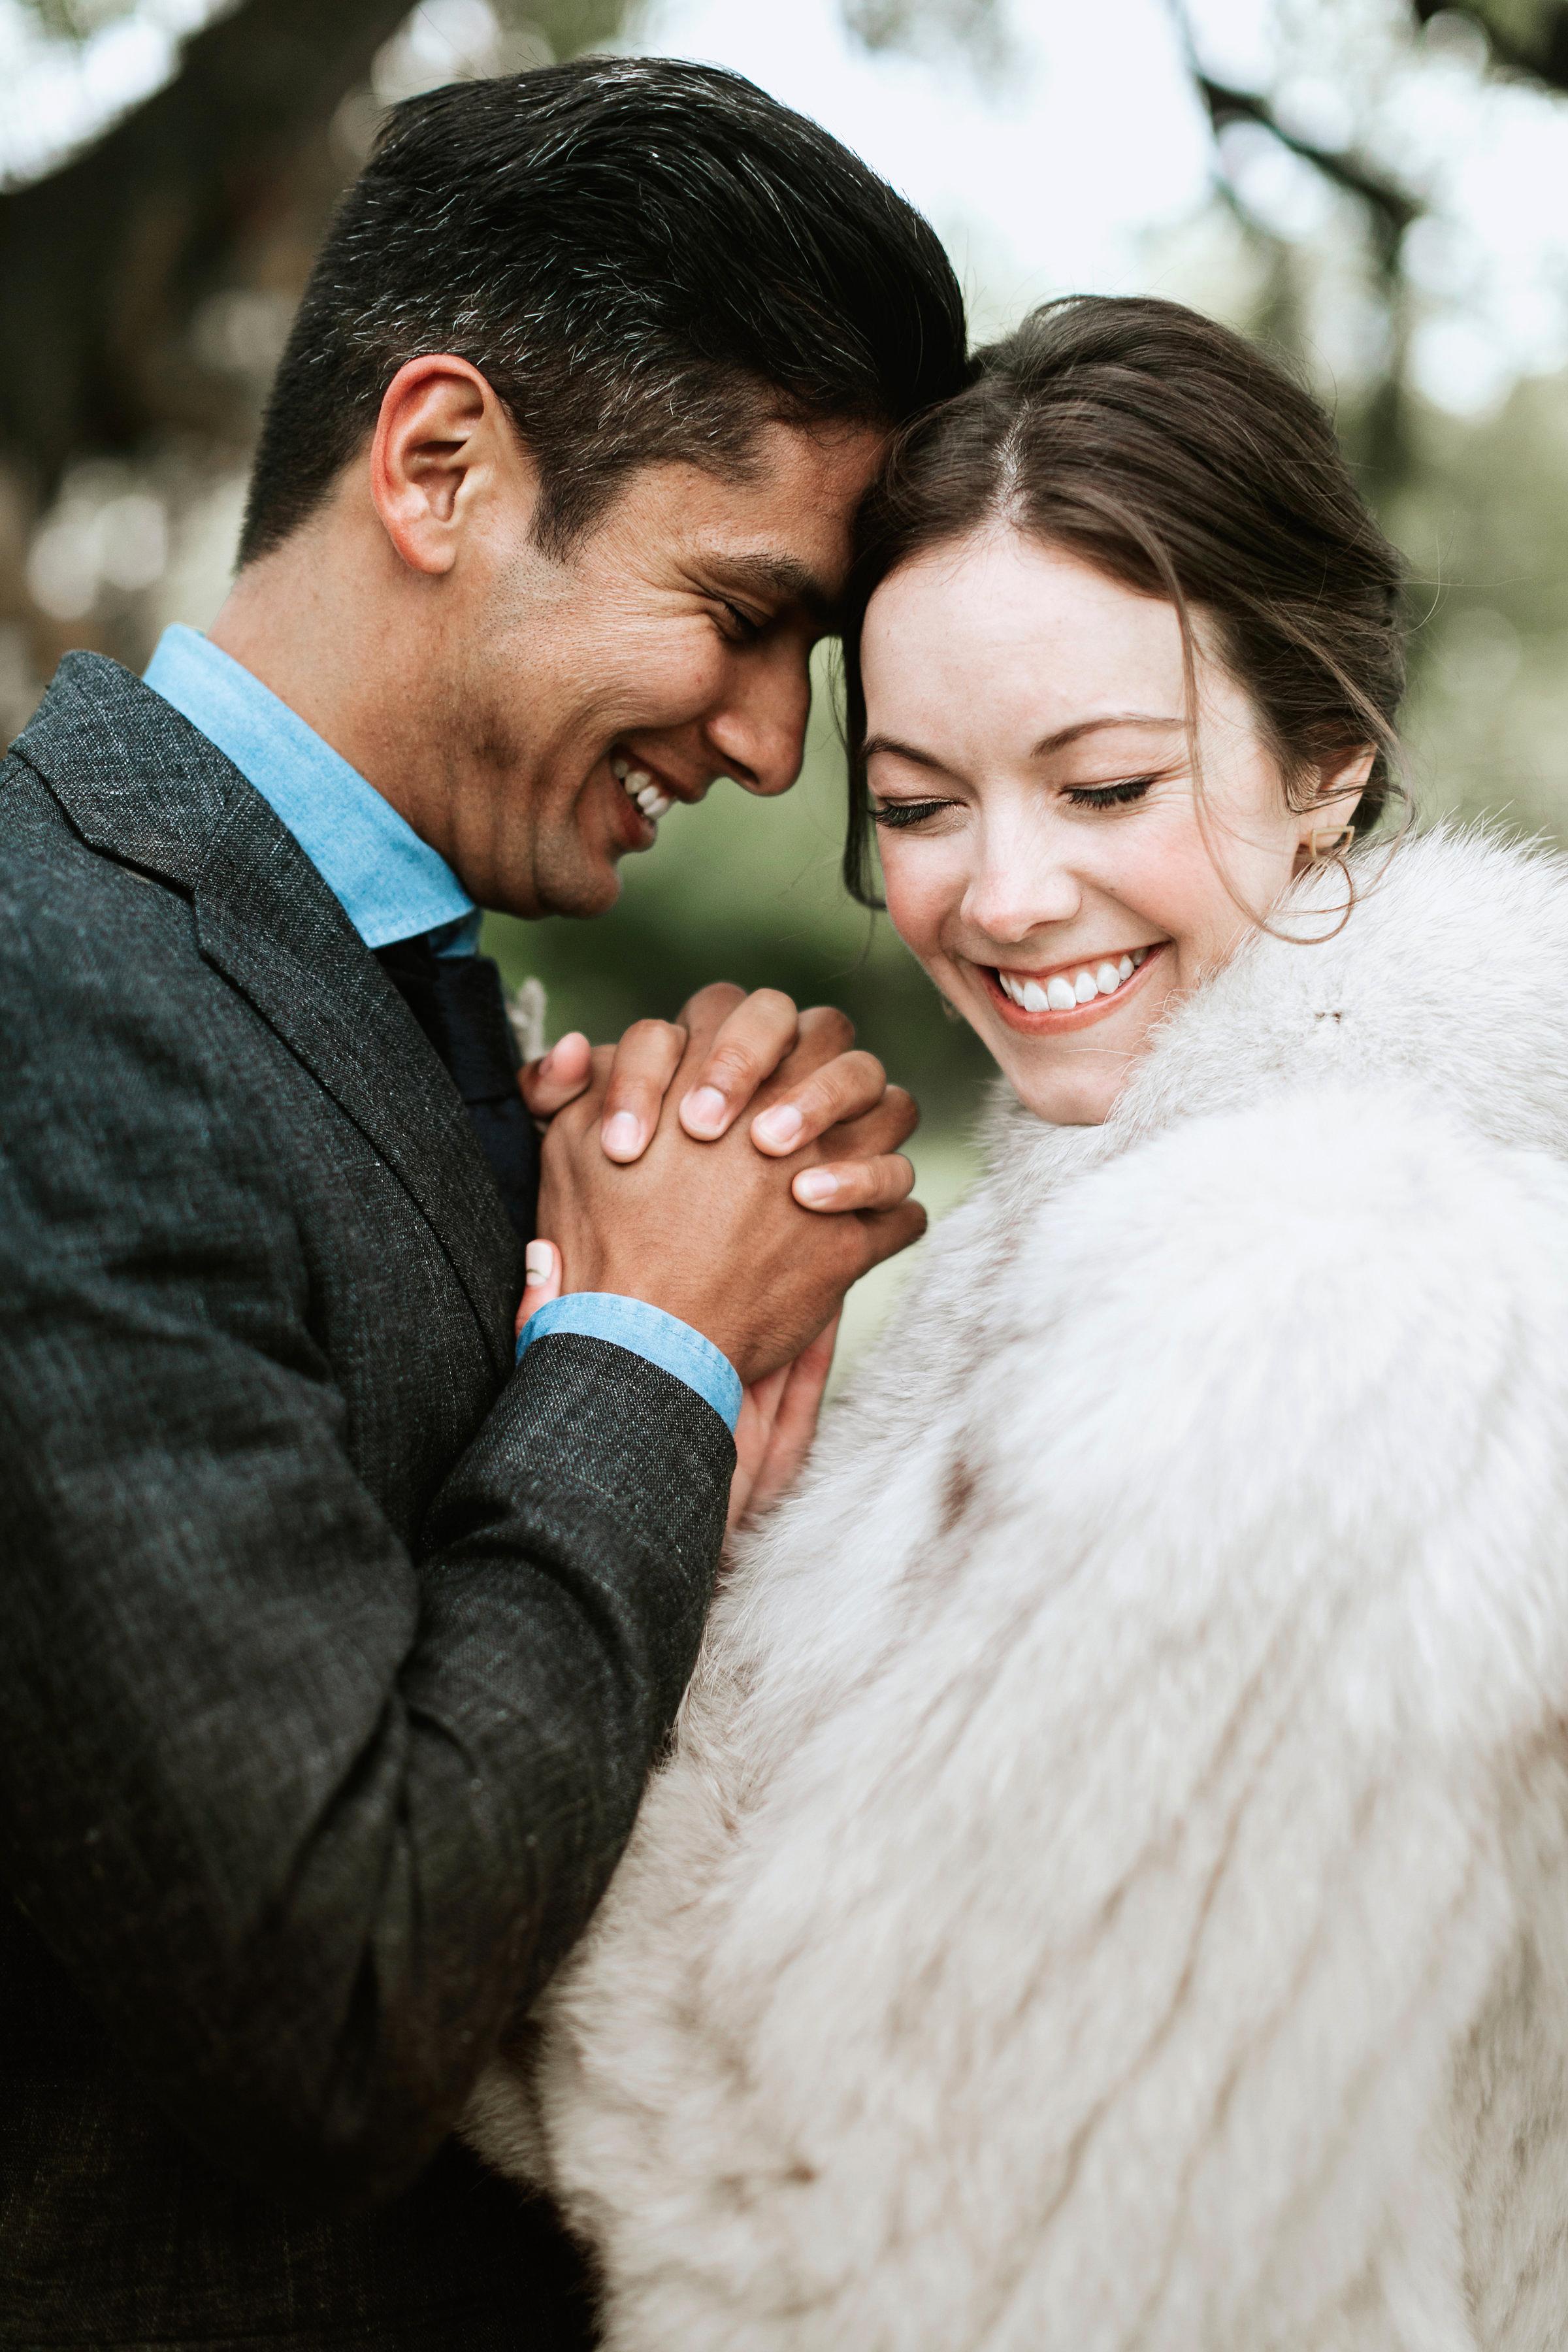 shannon jason wedding bride groom couple holding hands